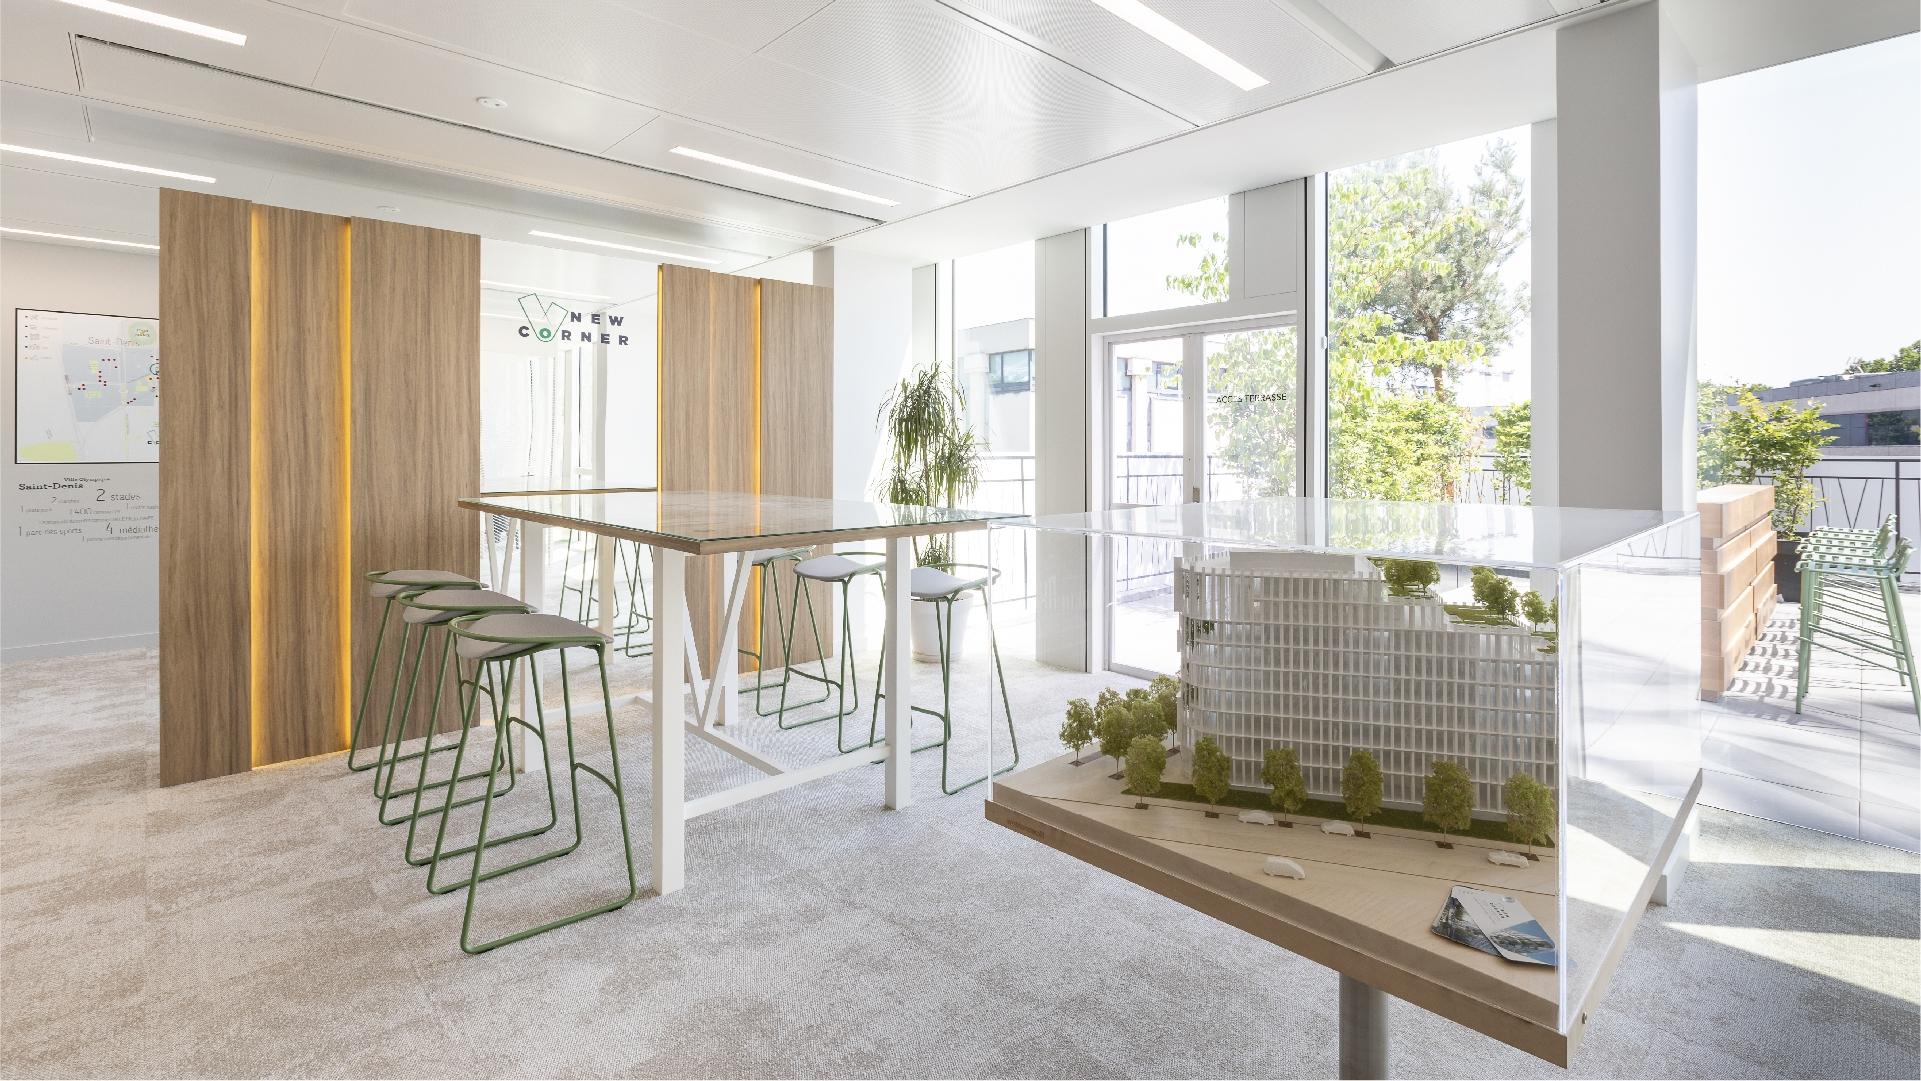 Project Design & Build Workplace Magic